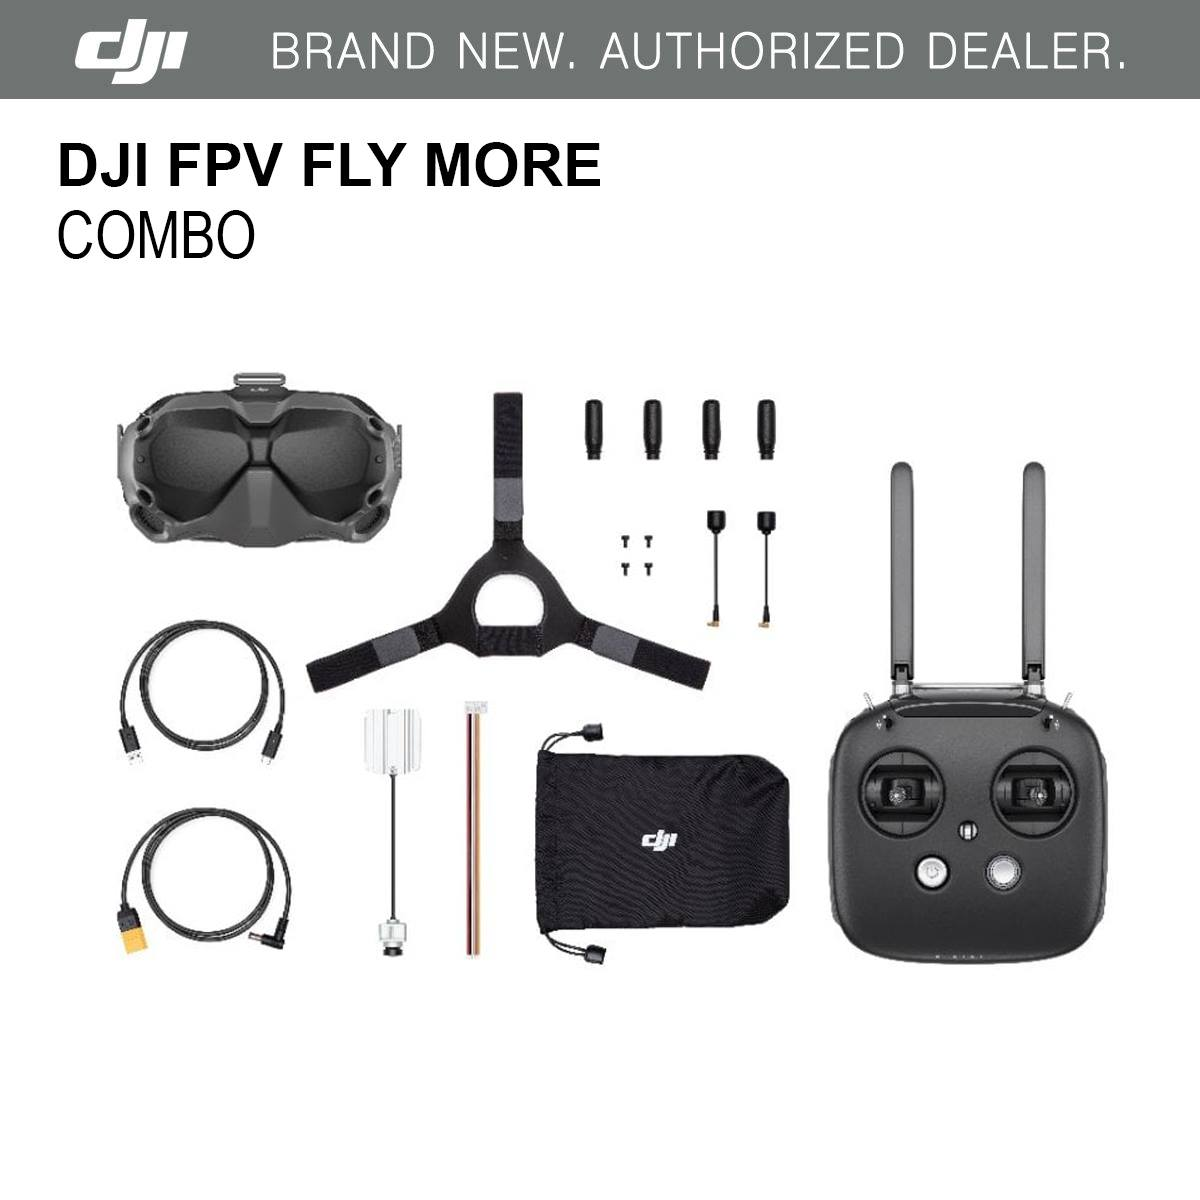 DJI FPV Fly More Combo